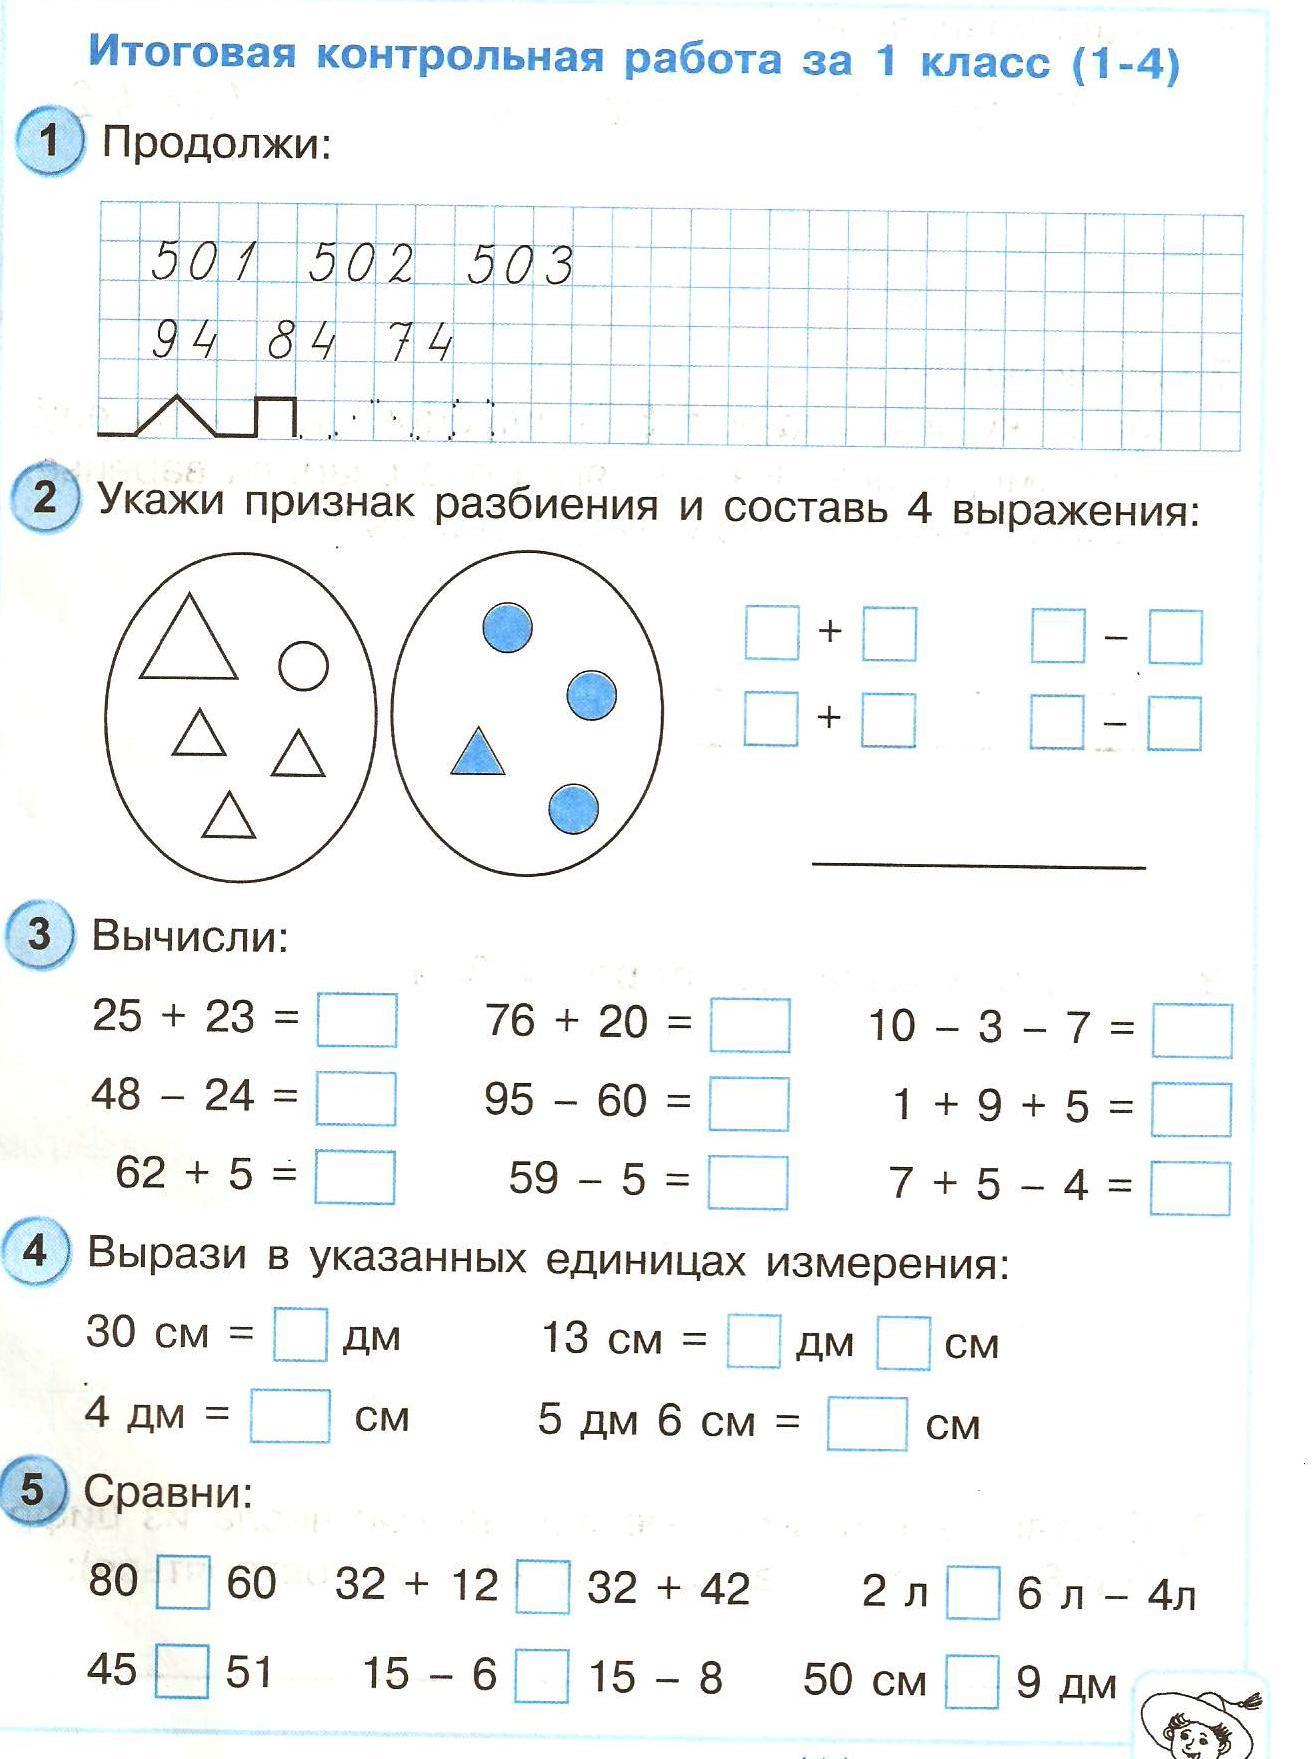 Ктп перспектива математика 2 класс петерсон